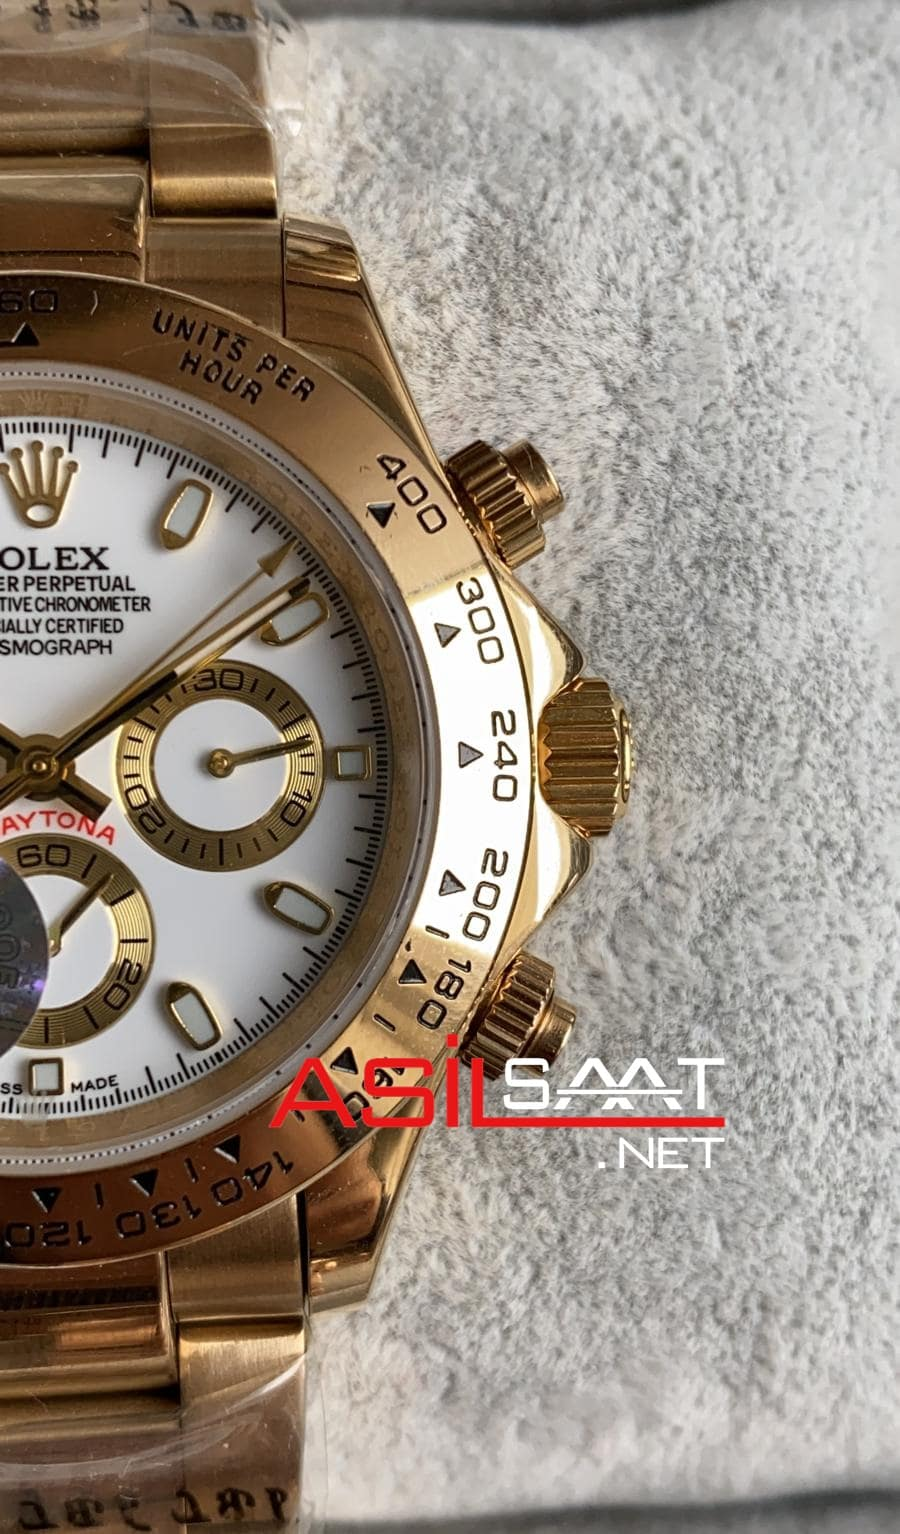 Rolex Oyster Perpetual Cosmograph Daytona Gold Replika Saat ROLDA018